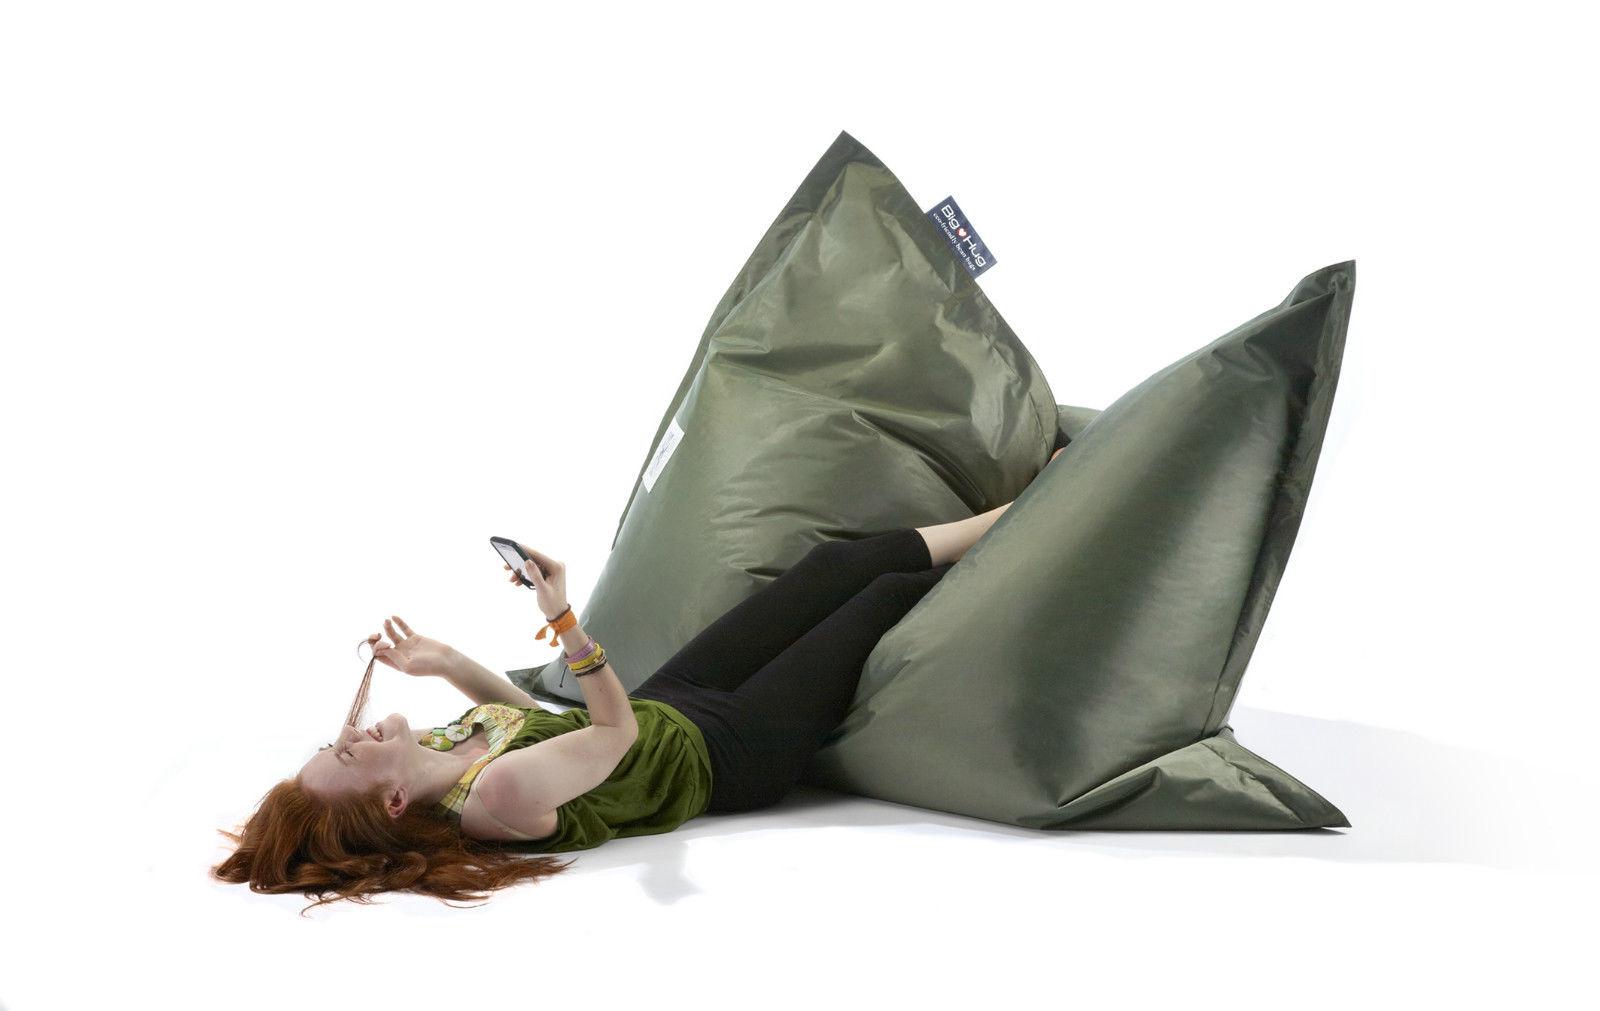 FULLSAC sofa exterior impermeable